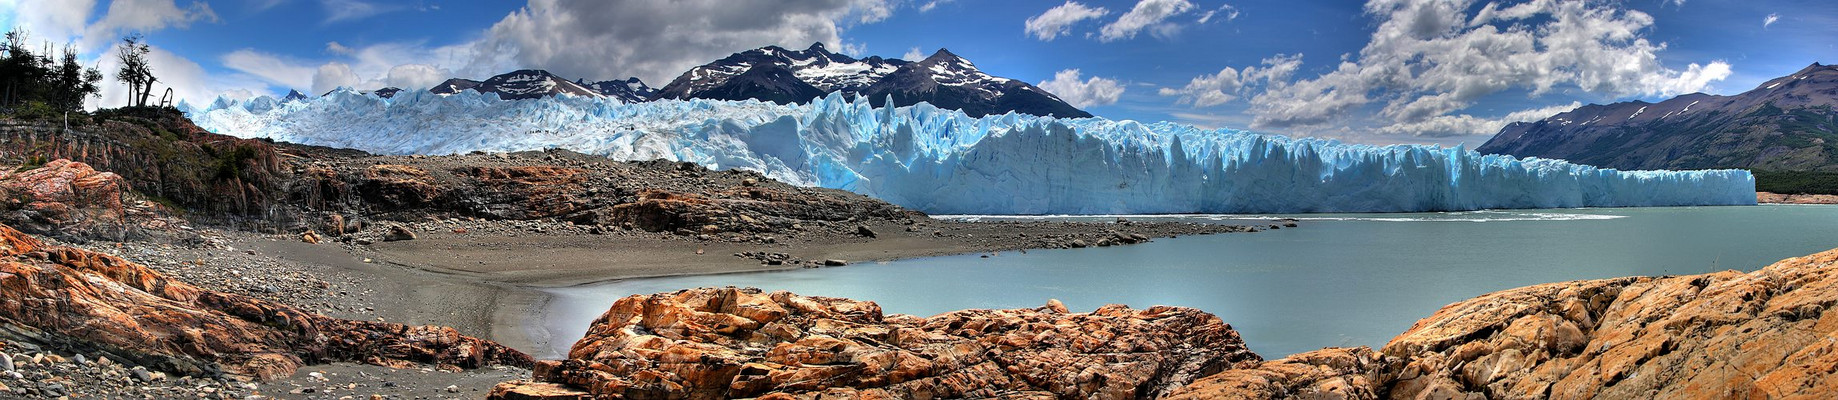 Argentinien (6) - Perito Moreno